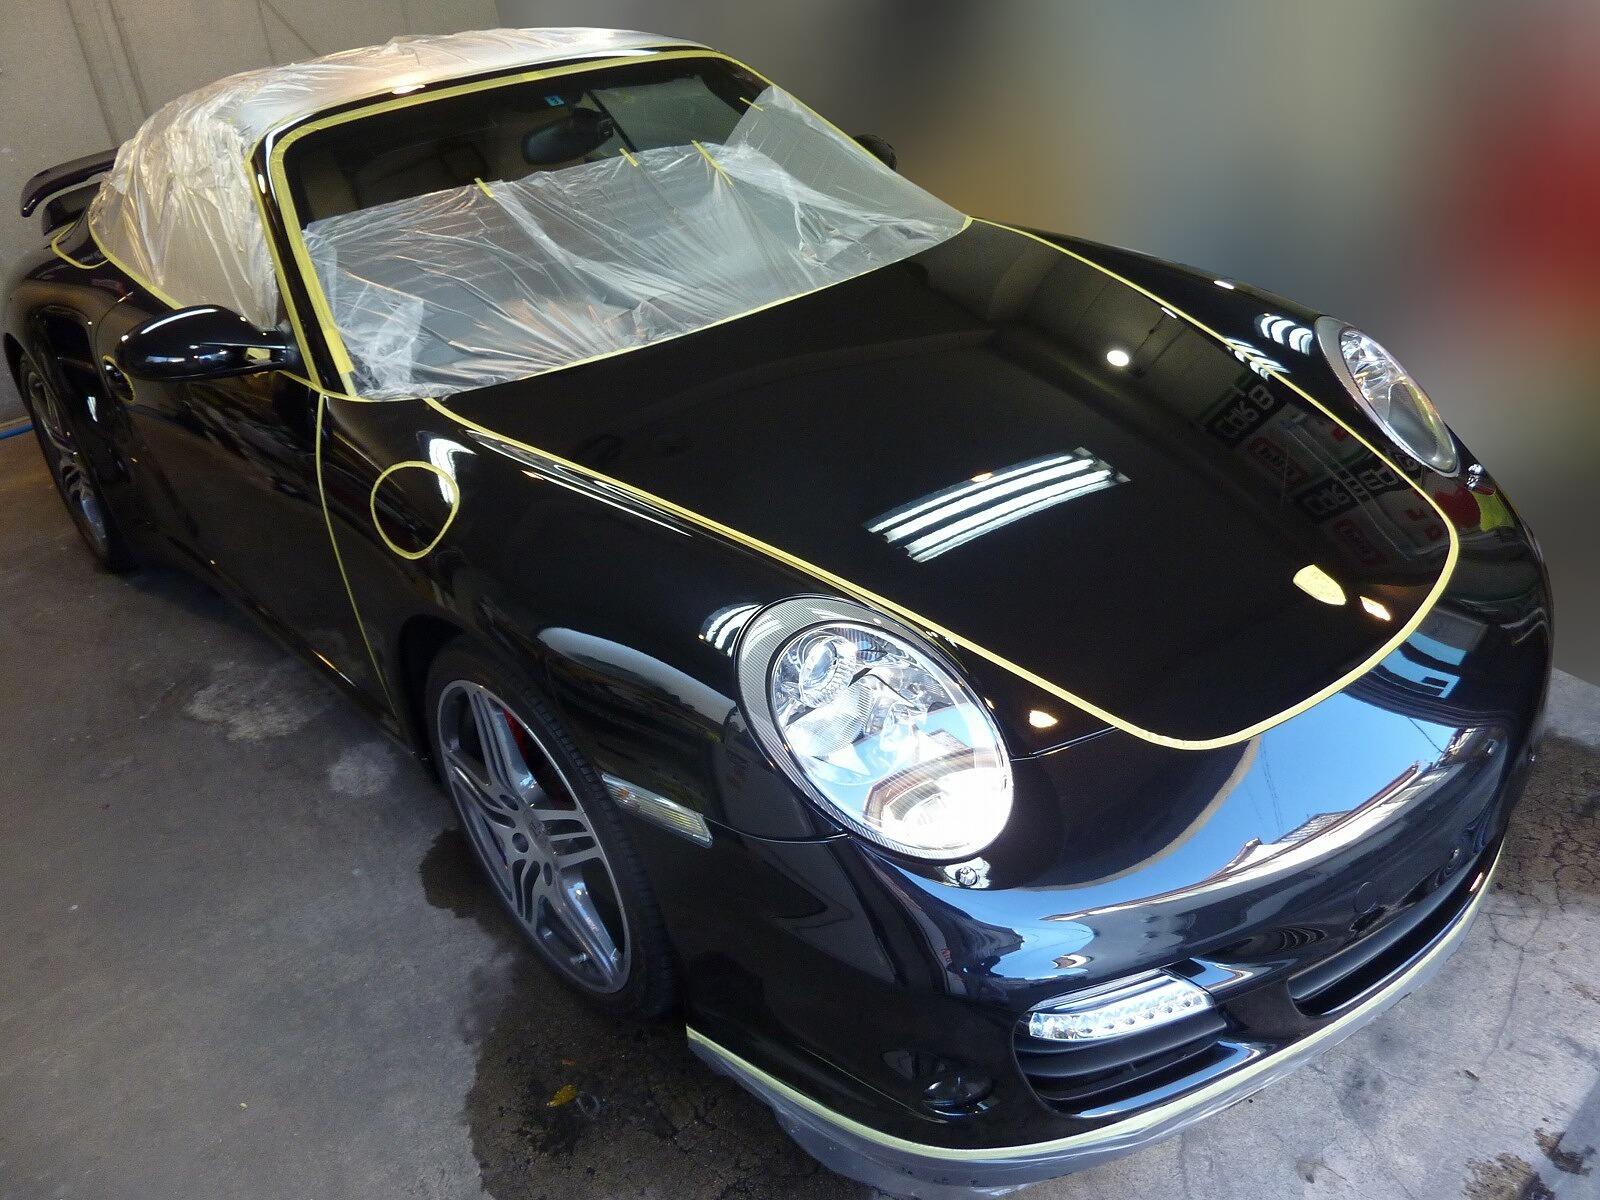 20140402-porsche-911-turbo-03